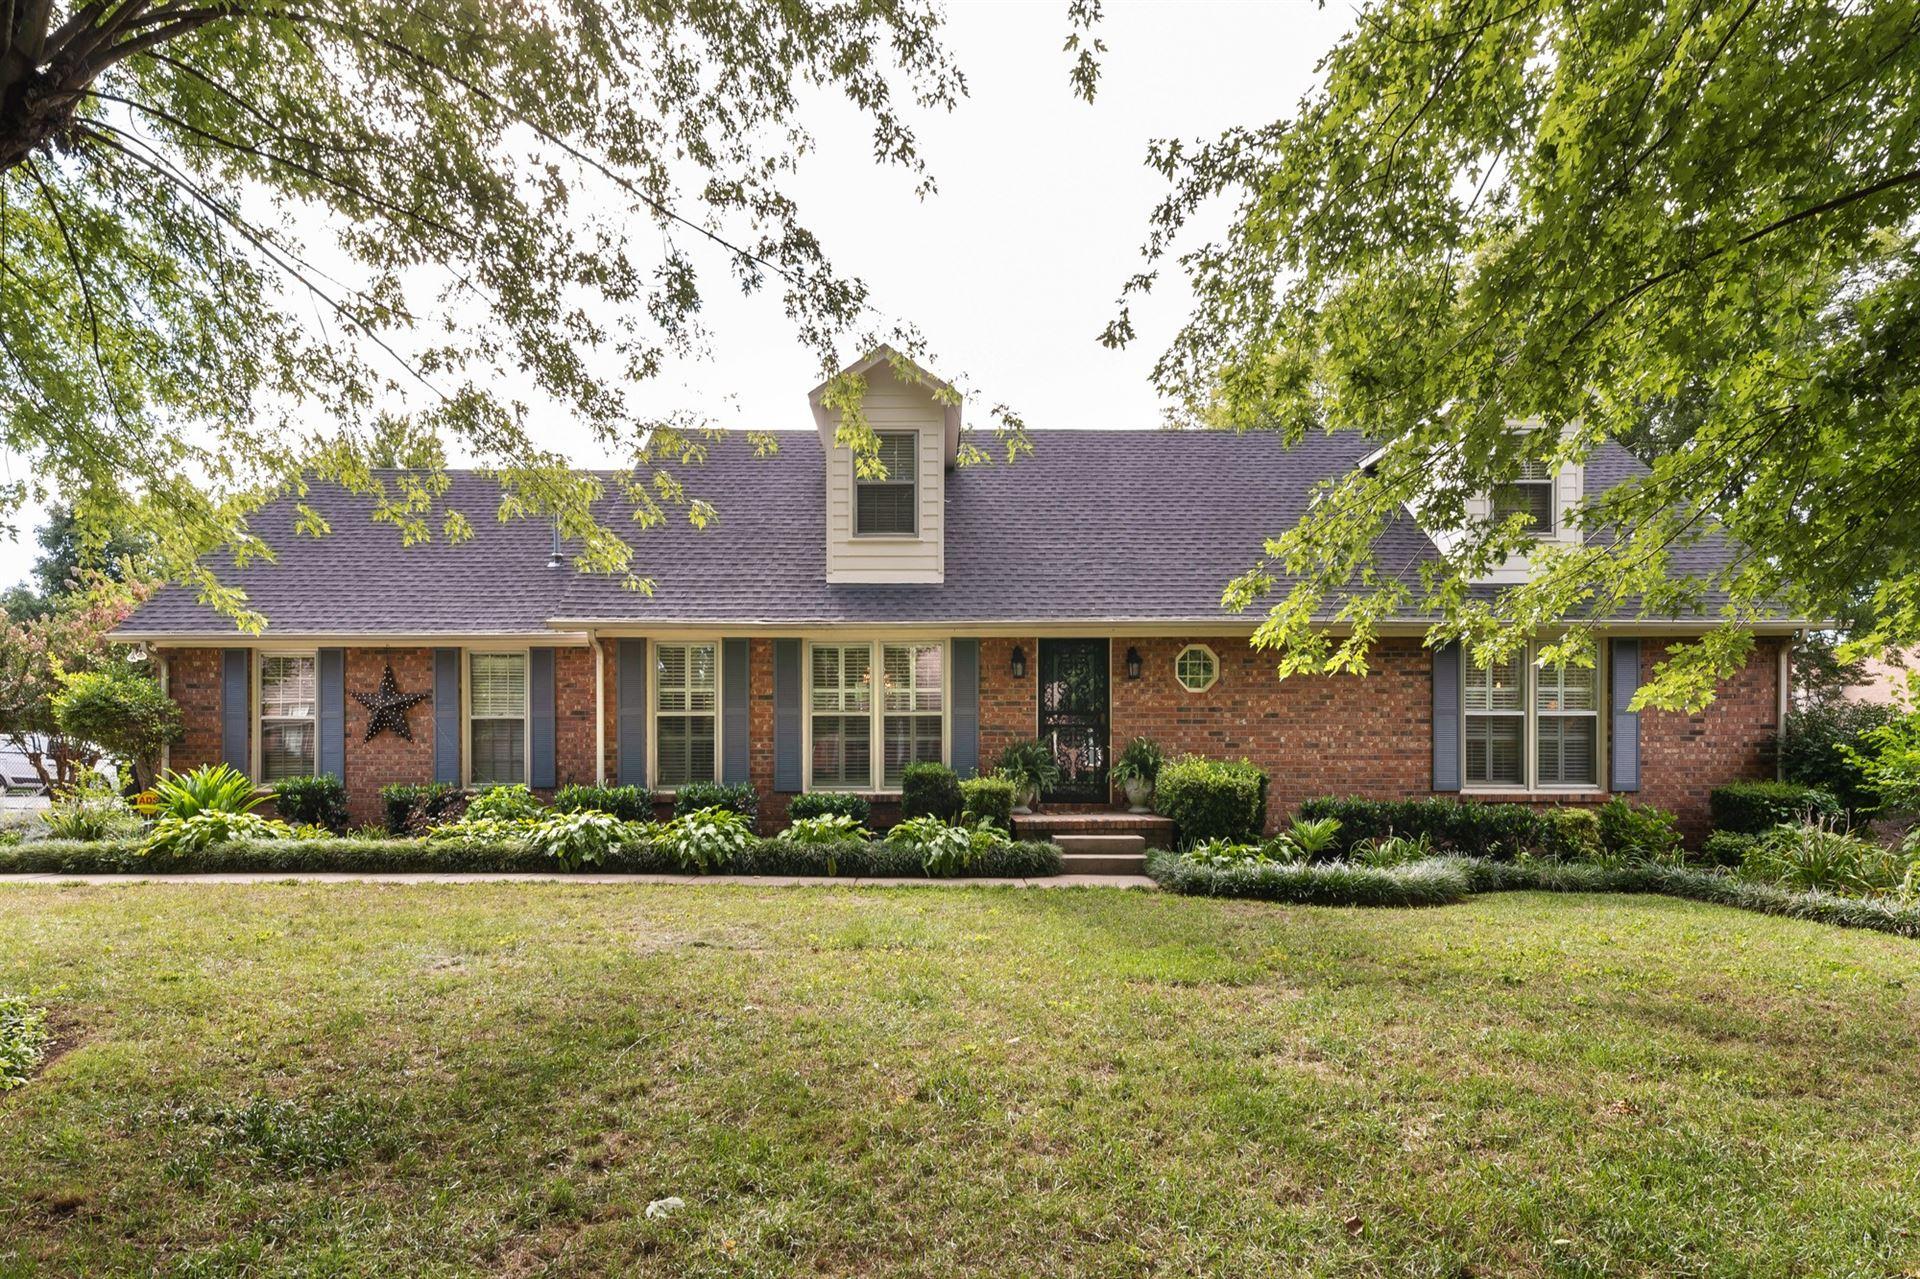 2819 Regency Park Dr, Murfreesboro, TN 37129 - MLS#: 2184967